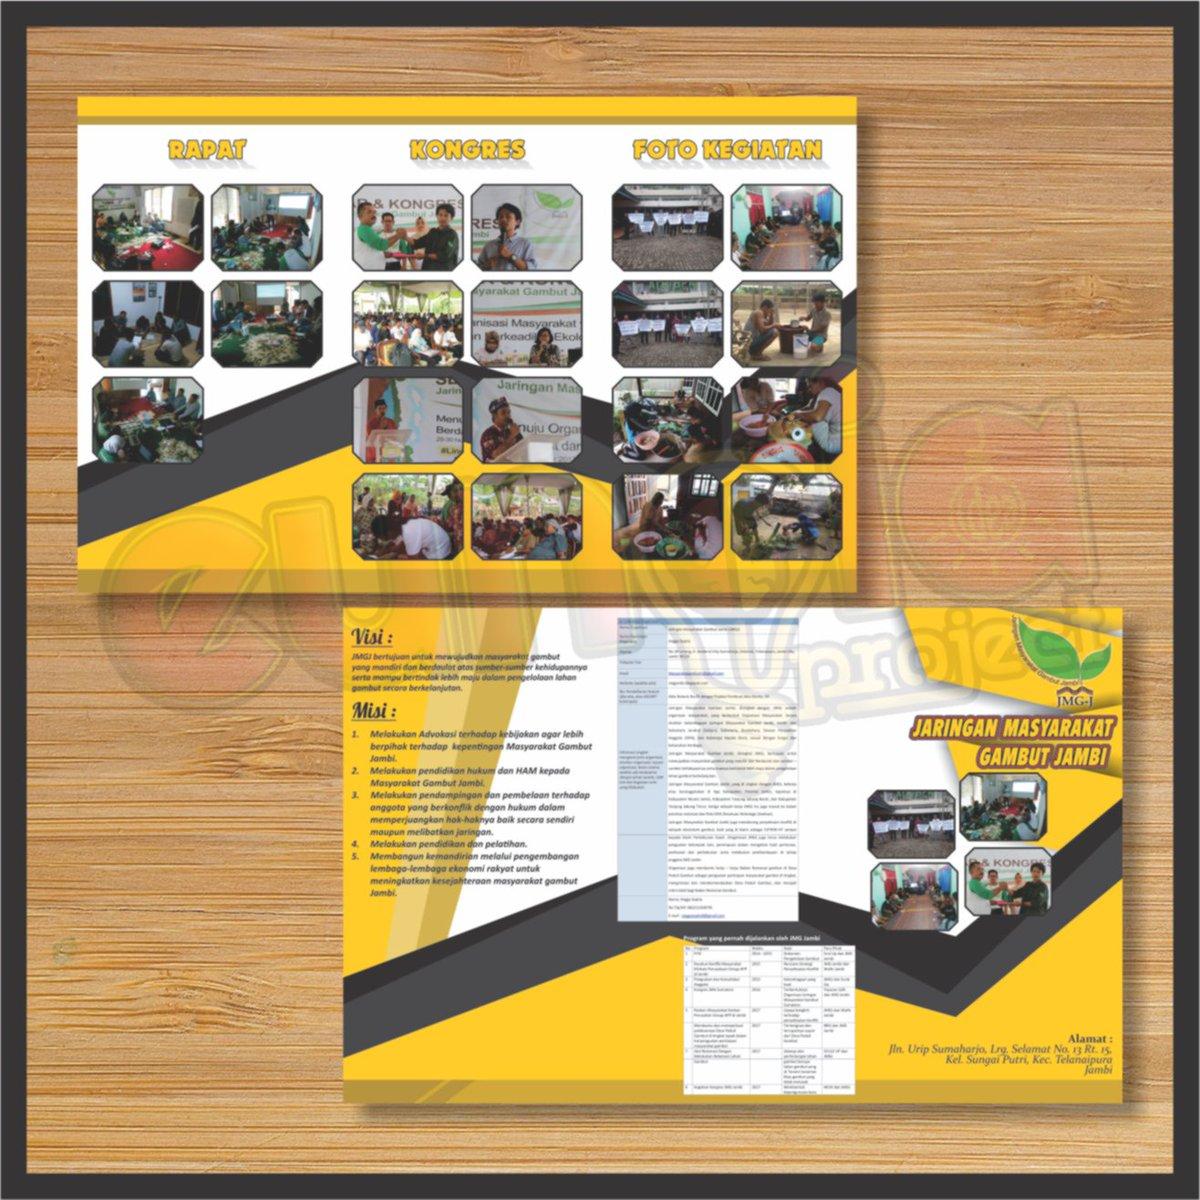 Eunoiaproject13 On Twitter Brosur Adalah Suatu Alat Untuk Promosi Barang Jasa Dan Lain Lain Yang Terbuat Dari Kertas Yang Dimana Di Dalamnya Terdapat Sejumlah Informasi Dan Juga Penawaran Mengenai Jasa Atau Produk Tersebut Brosurmurah Brosur